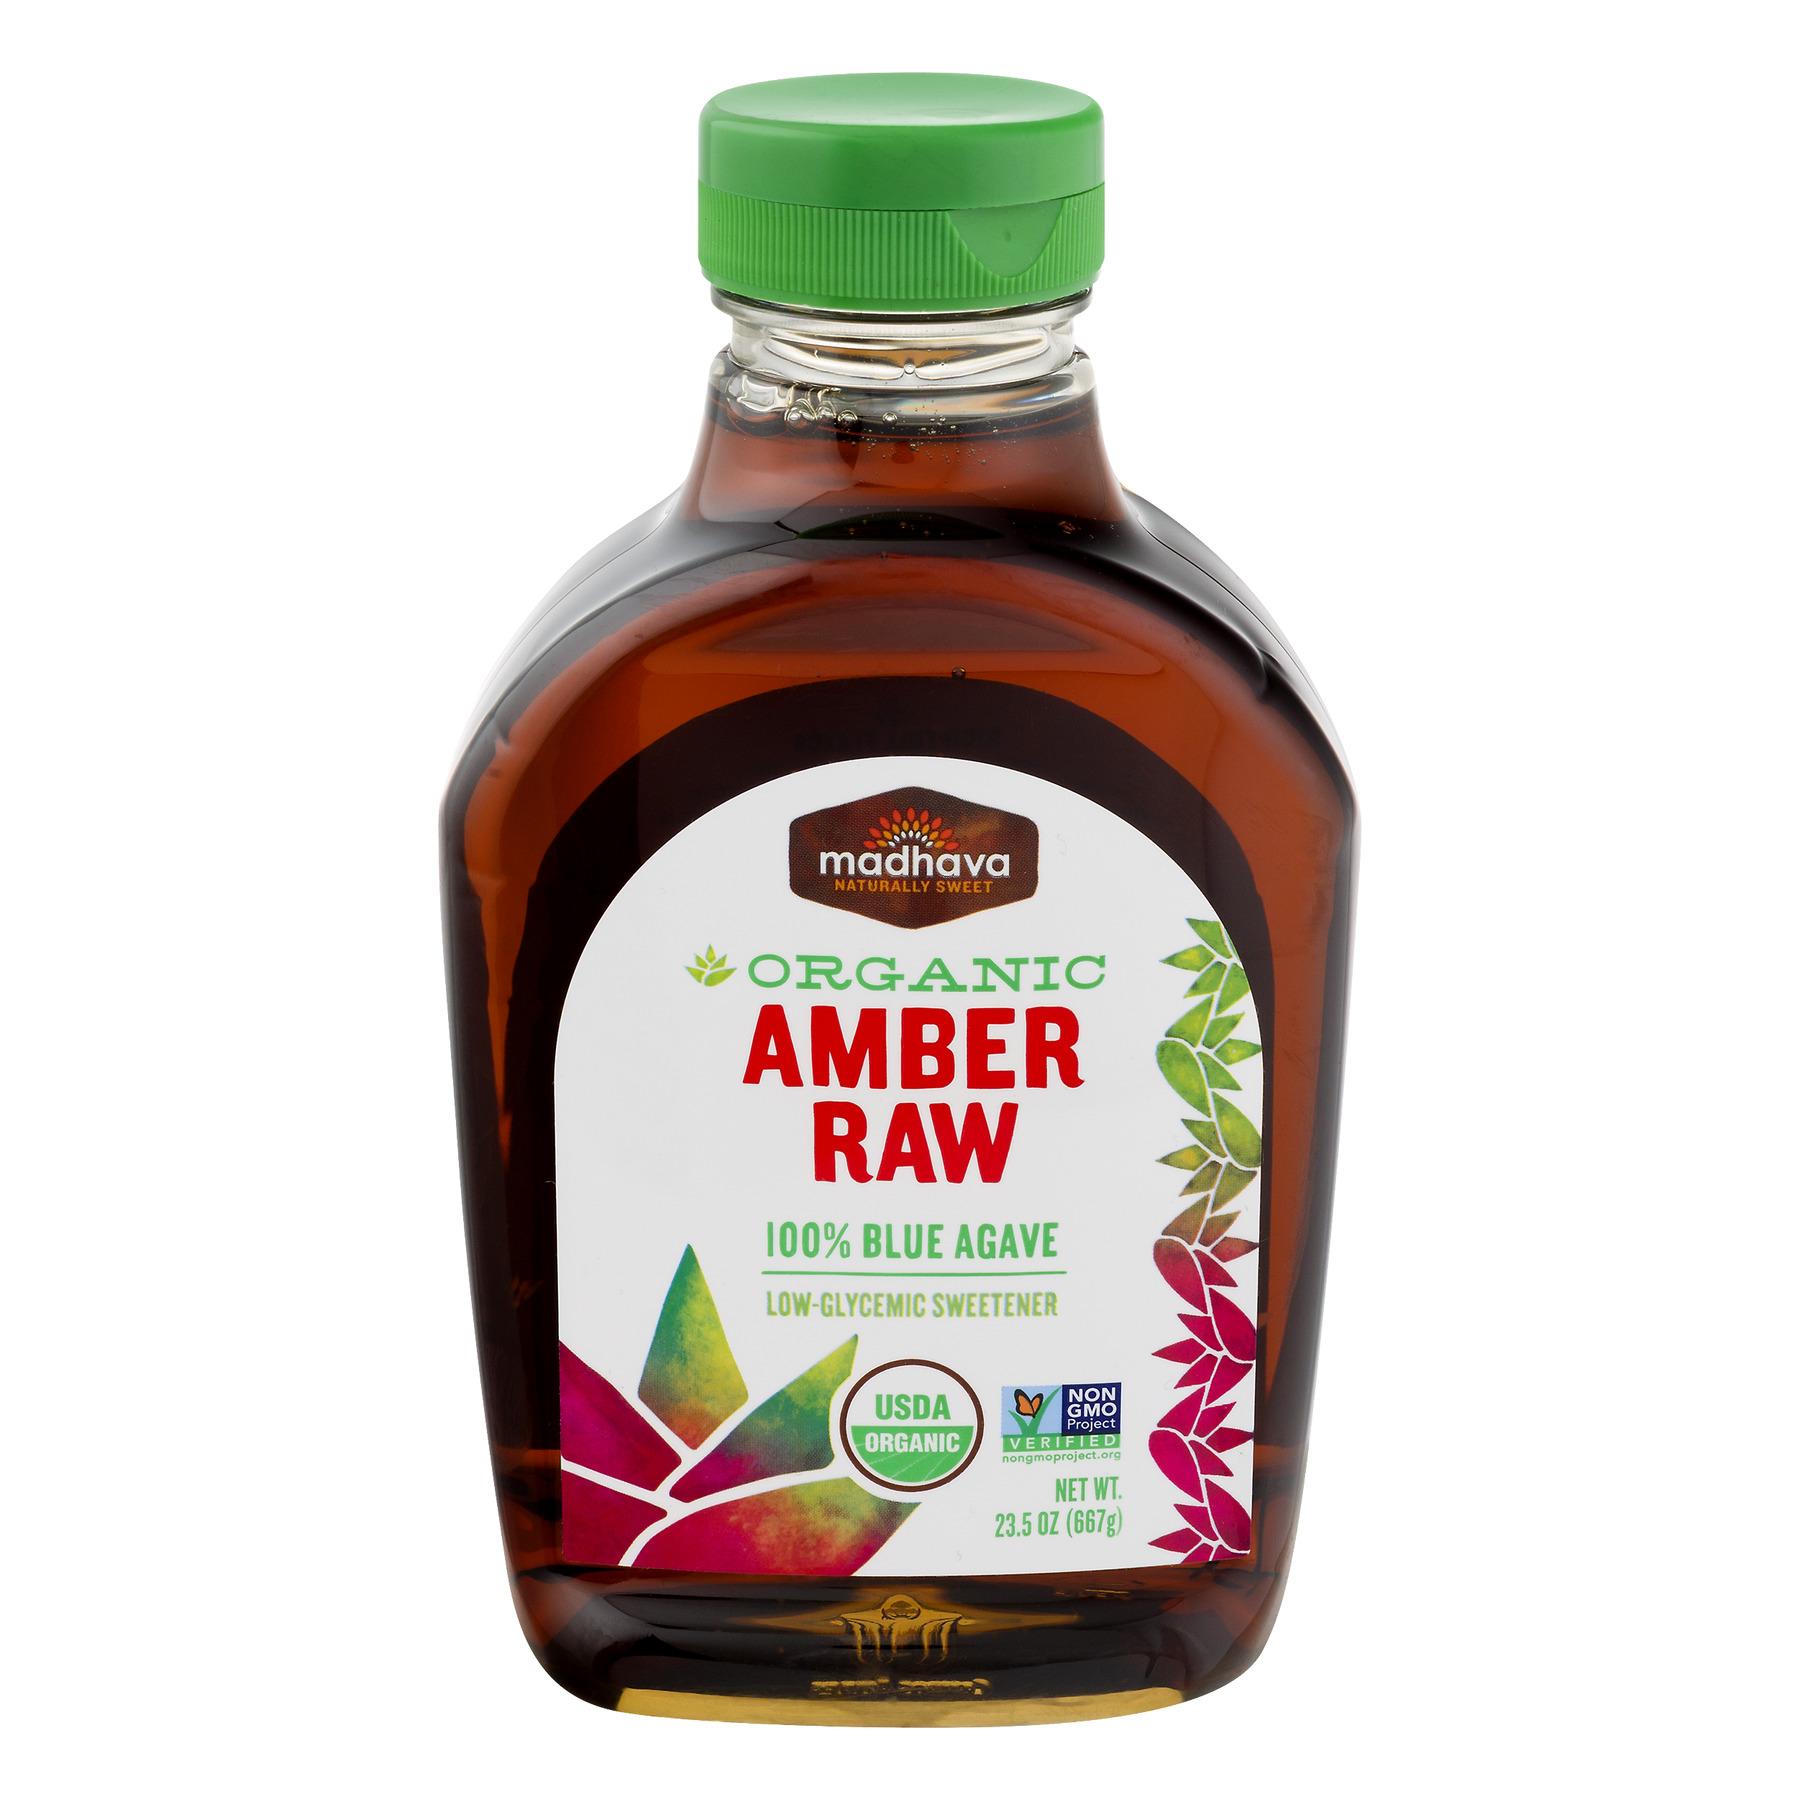 Madhava Organic Amber Raw 100% Blue Agave 23.5 oz.